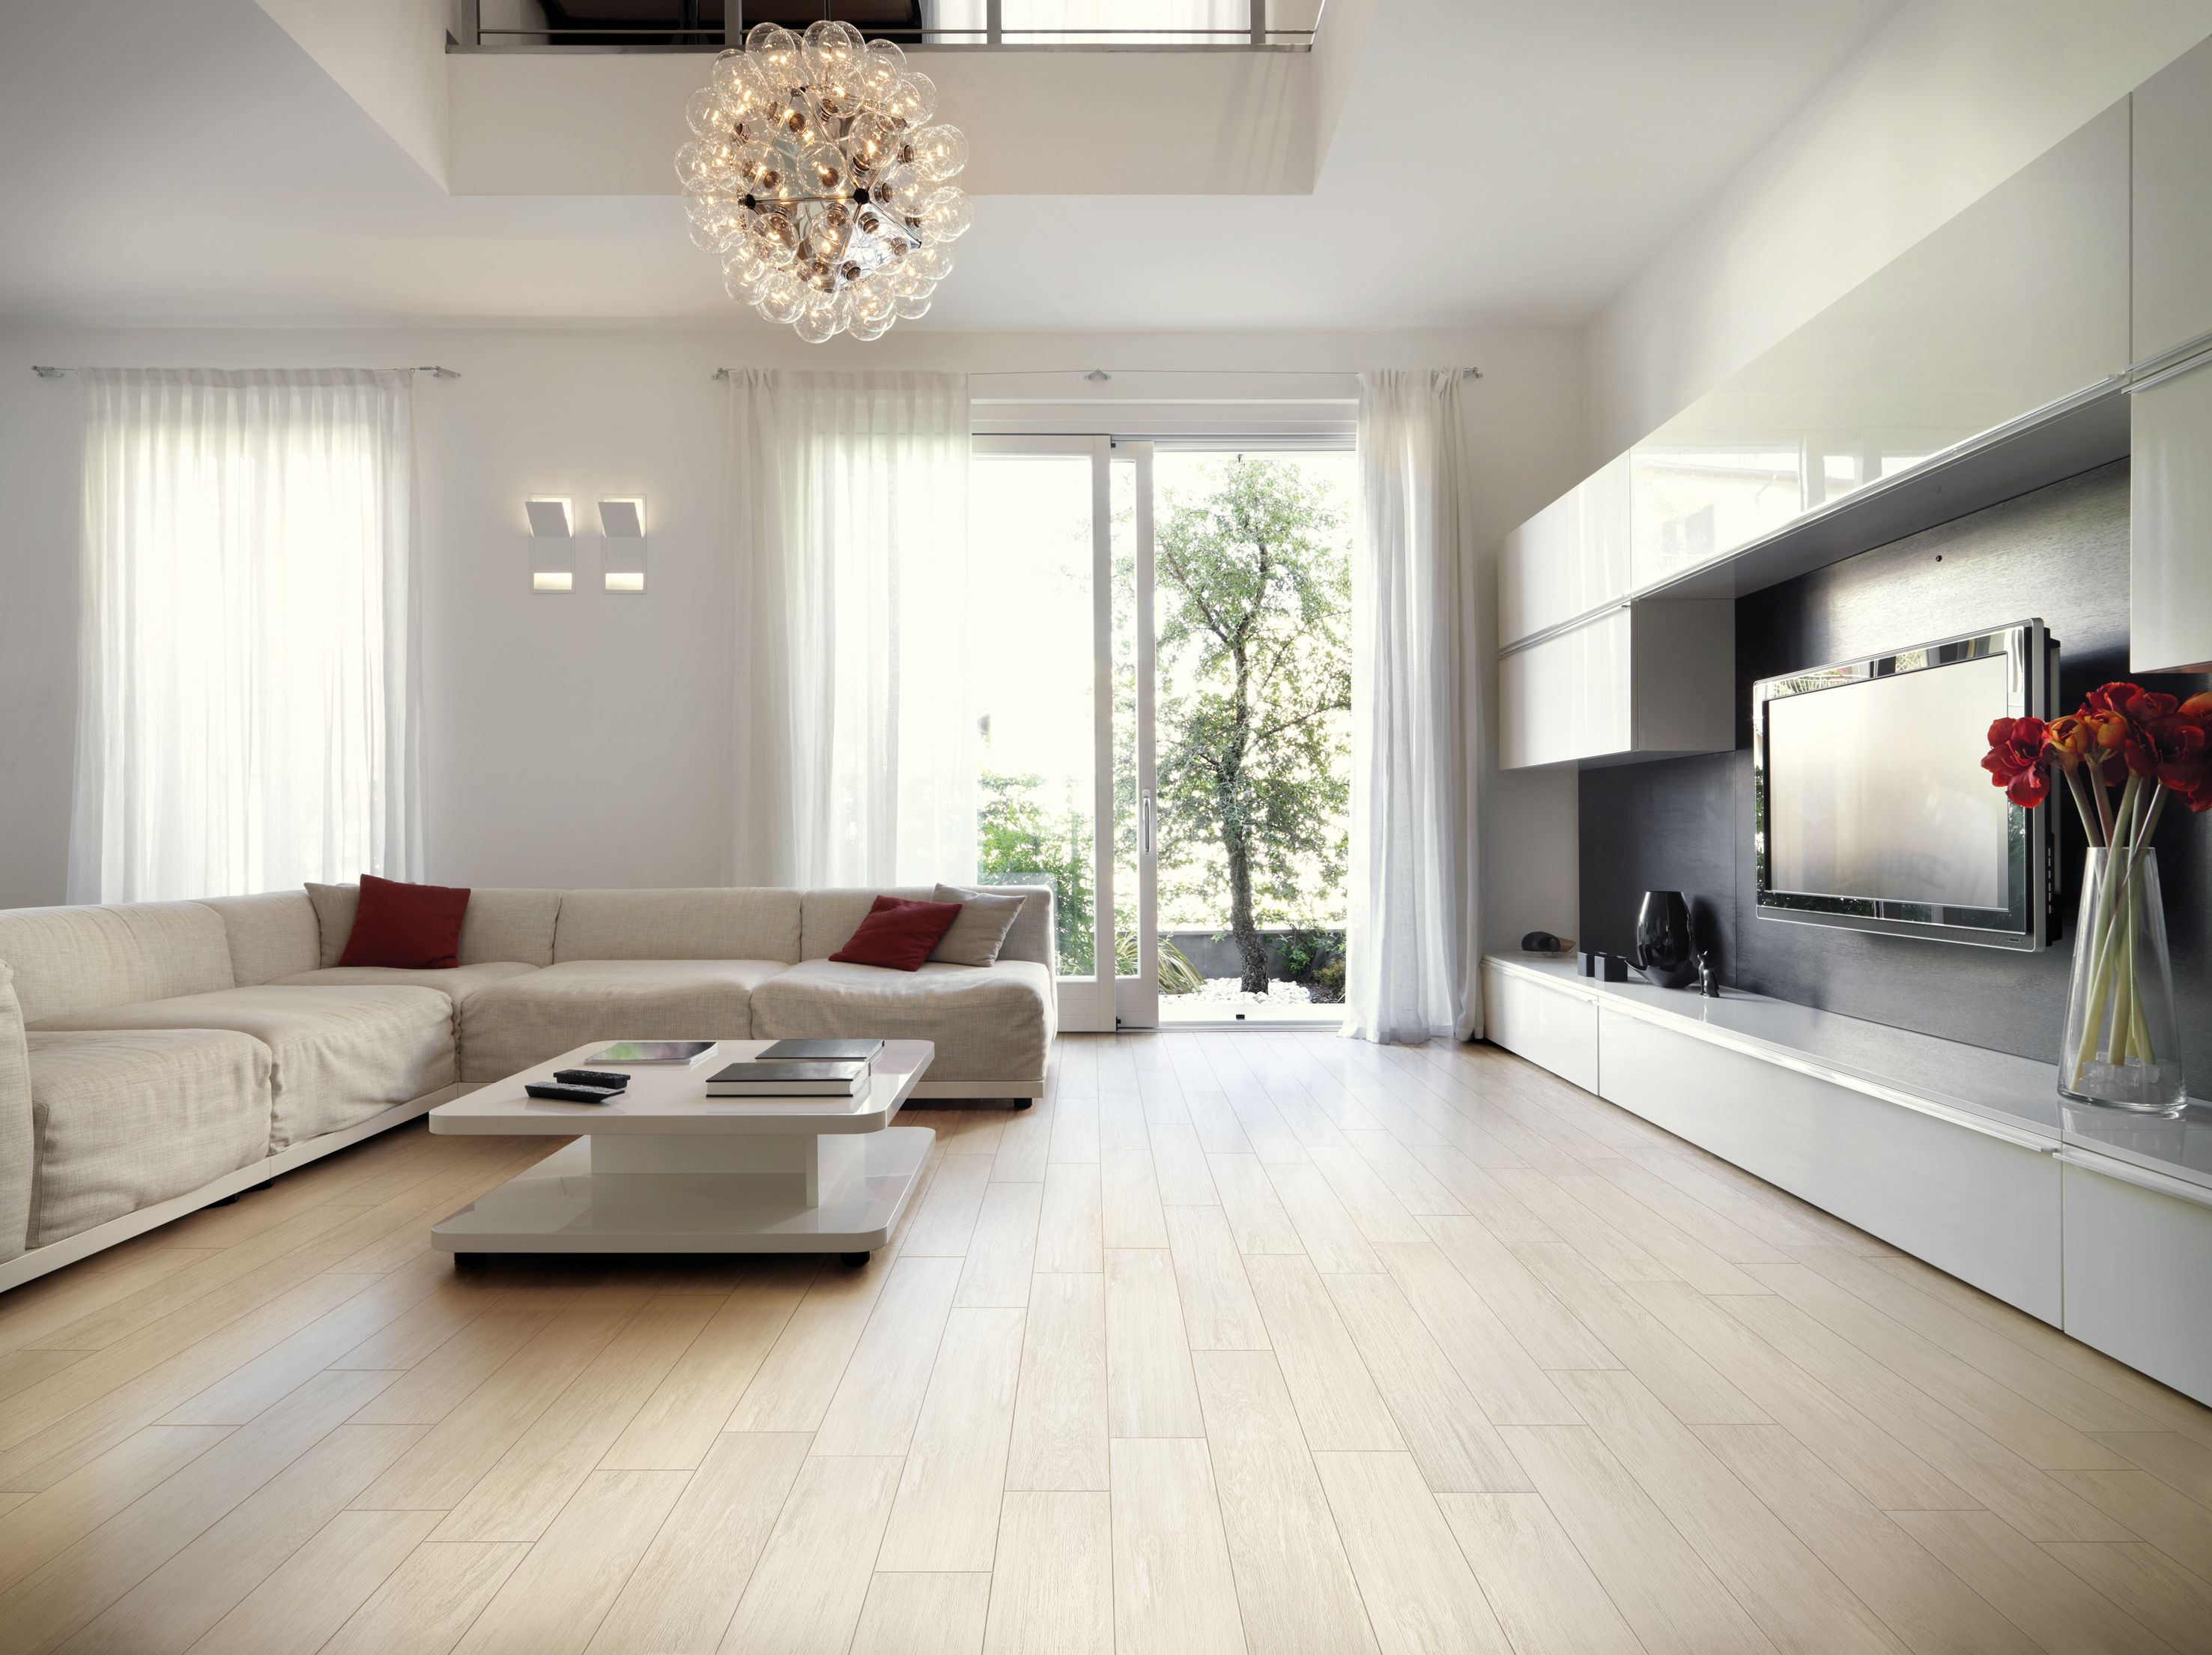 Italian Tiles That Look Like Timber Planks Trail Wood Effect Floor Tiles Living Room Flooring Wood Effect Tiles